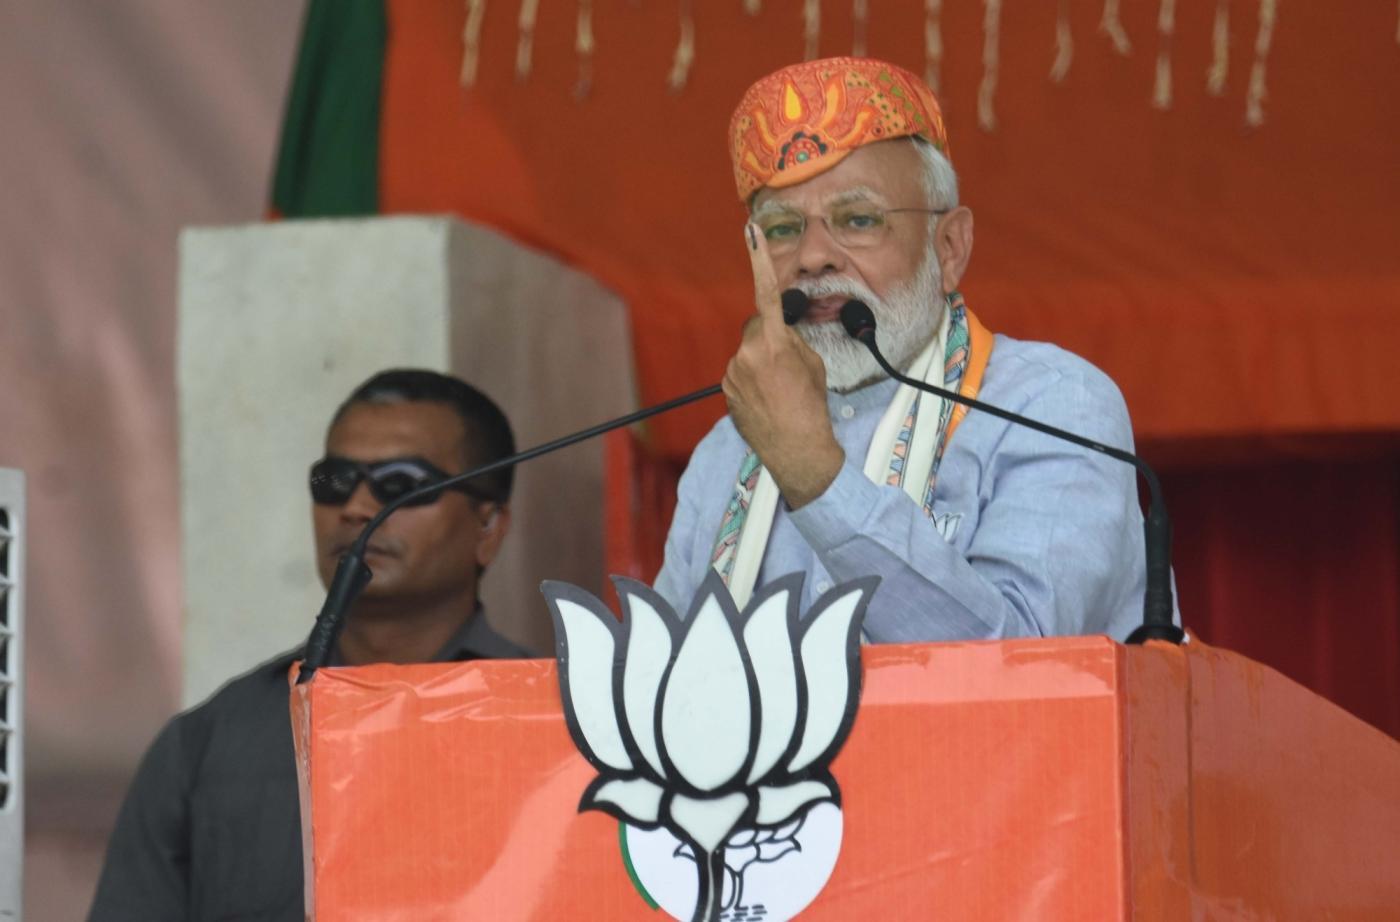 Darbhanga: Prime Minister Narendra Modi addresses a public rally in Darbhanga, Bihar, on April 25, 2019. (Photo: IANS) by .